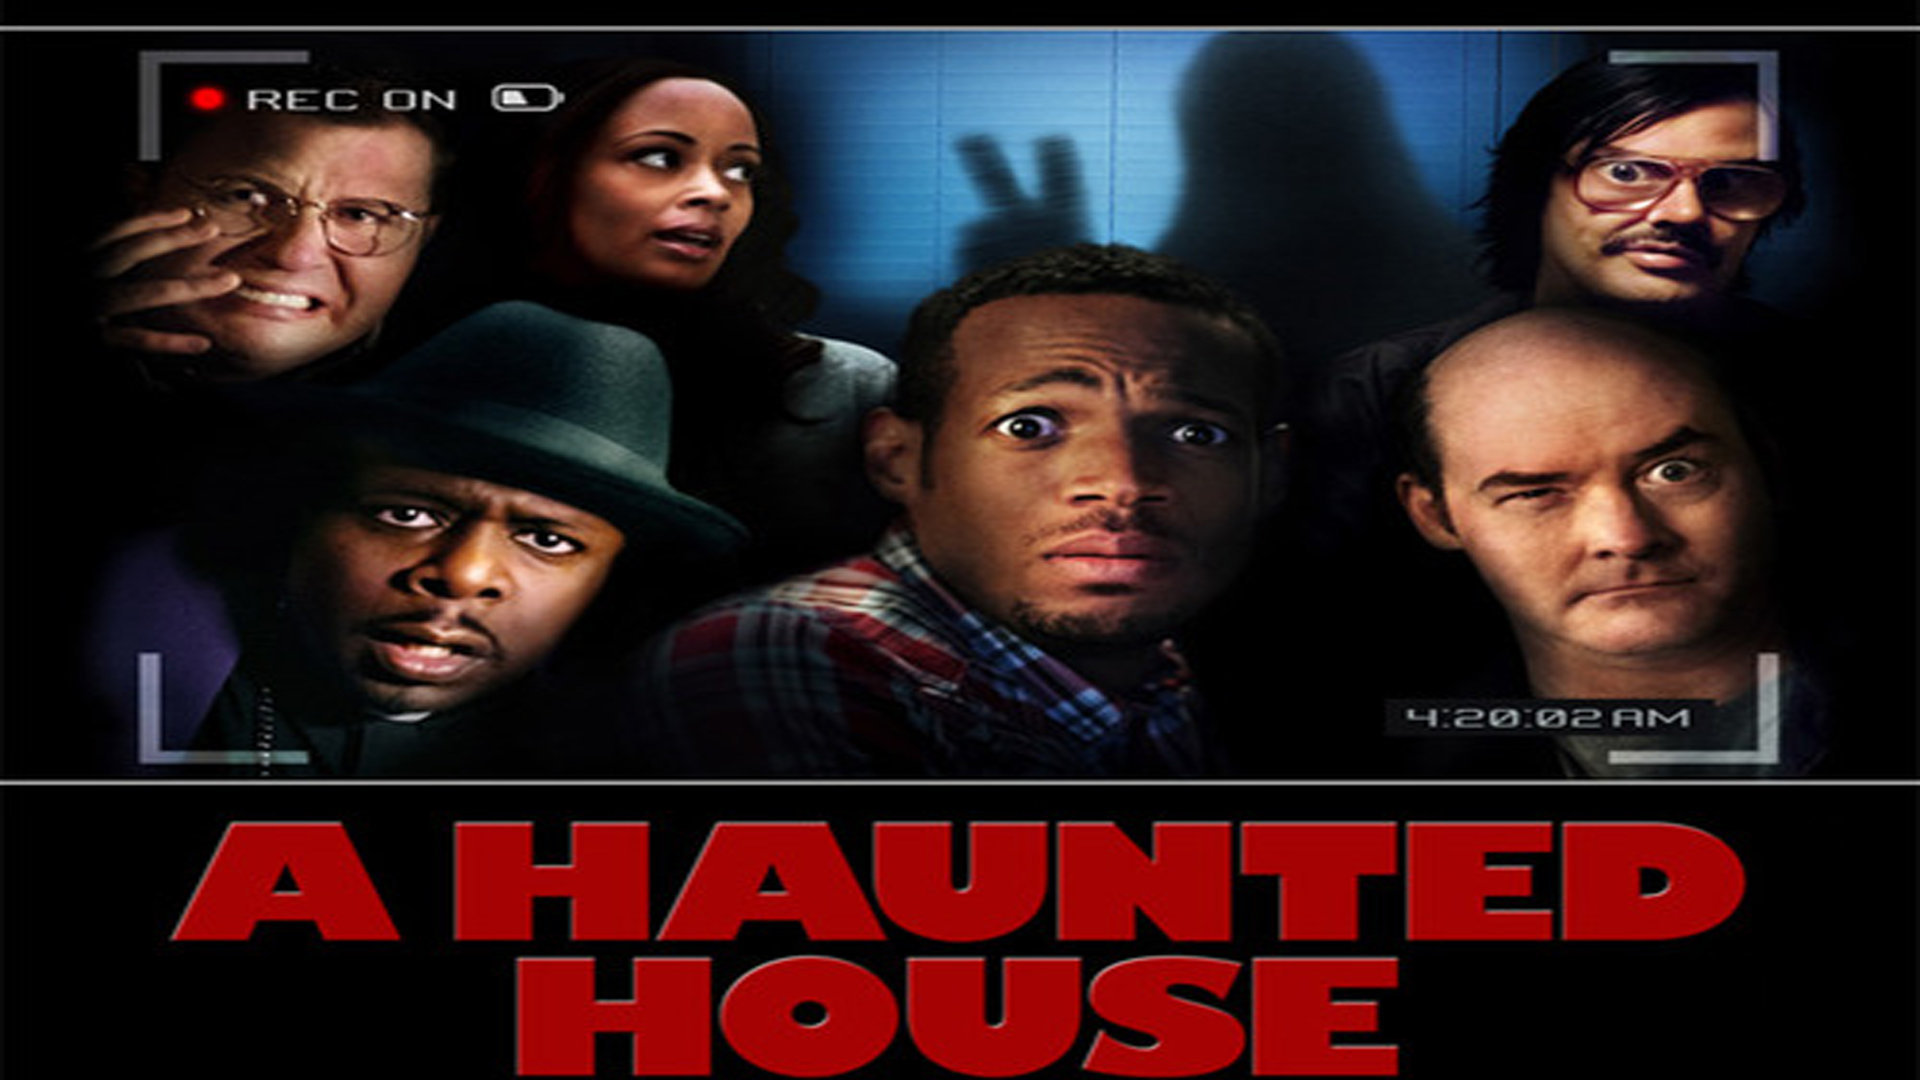 haunted house movie wallpaper hd Cinema Deviant 1920x1080